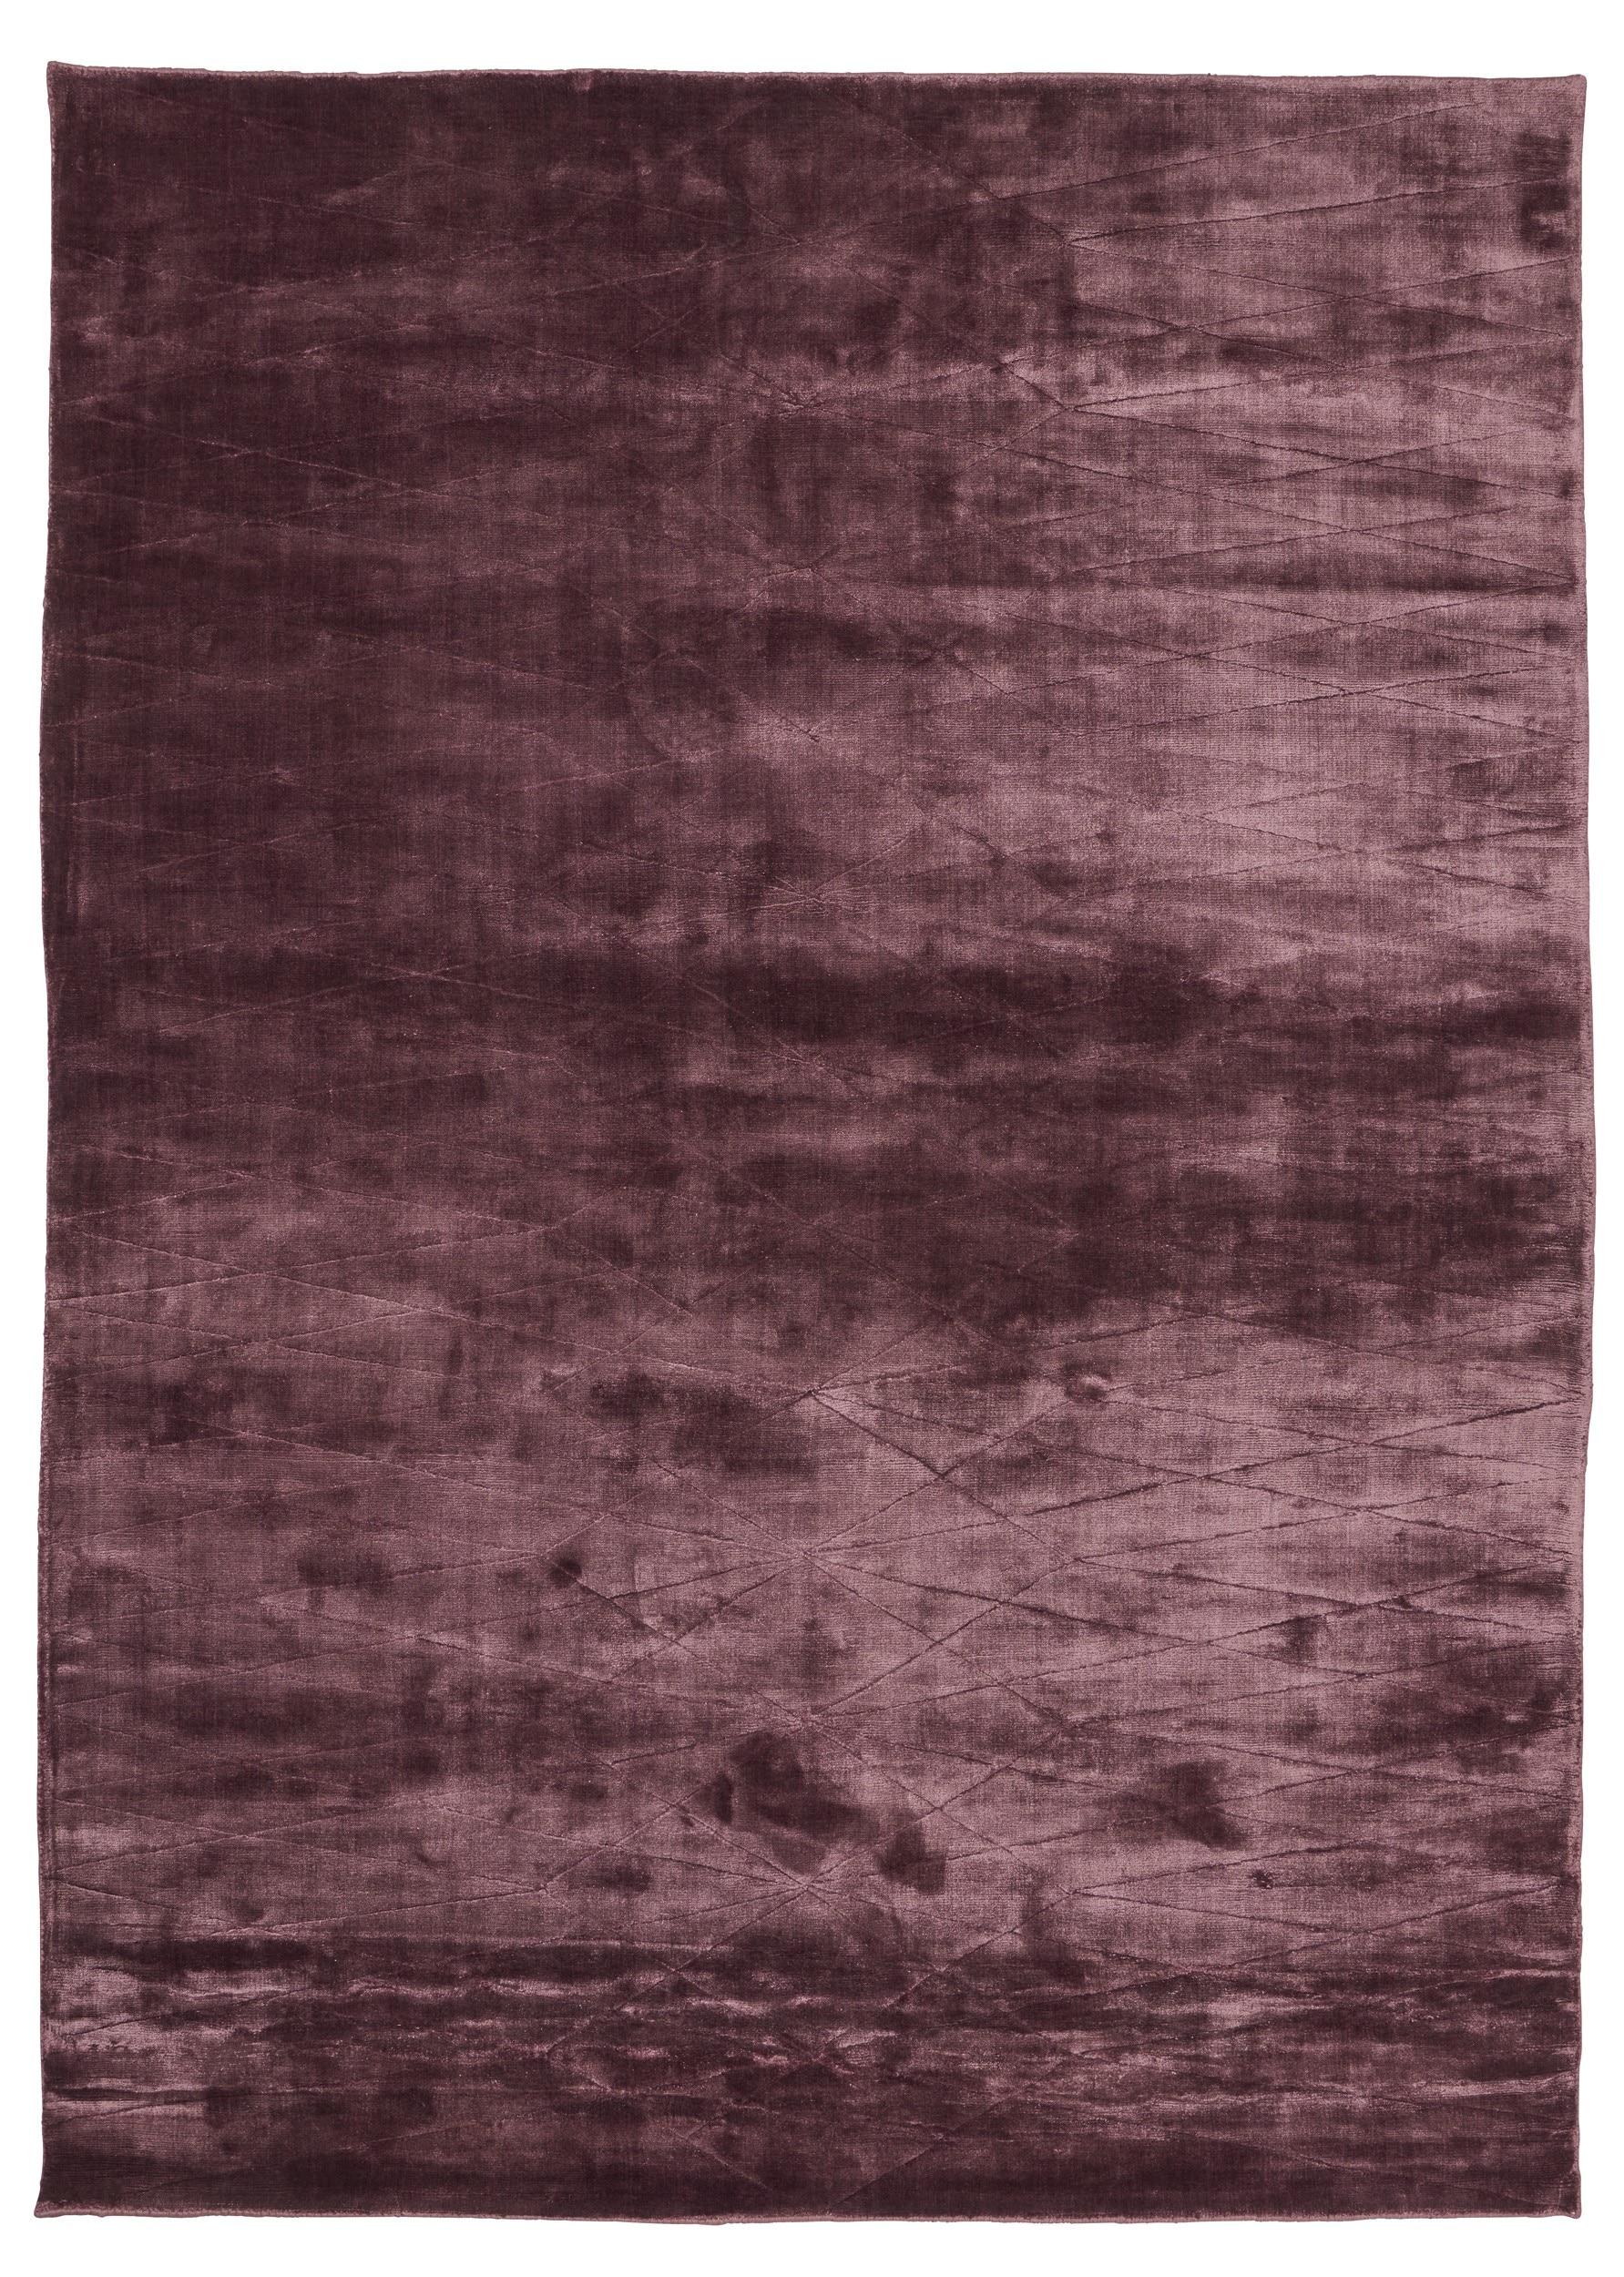 1915_2-1